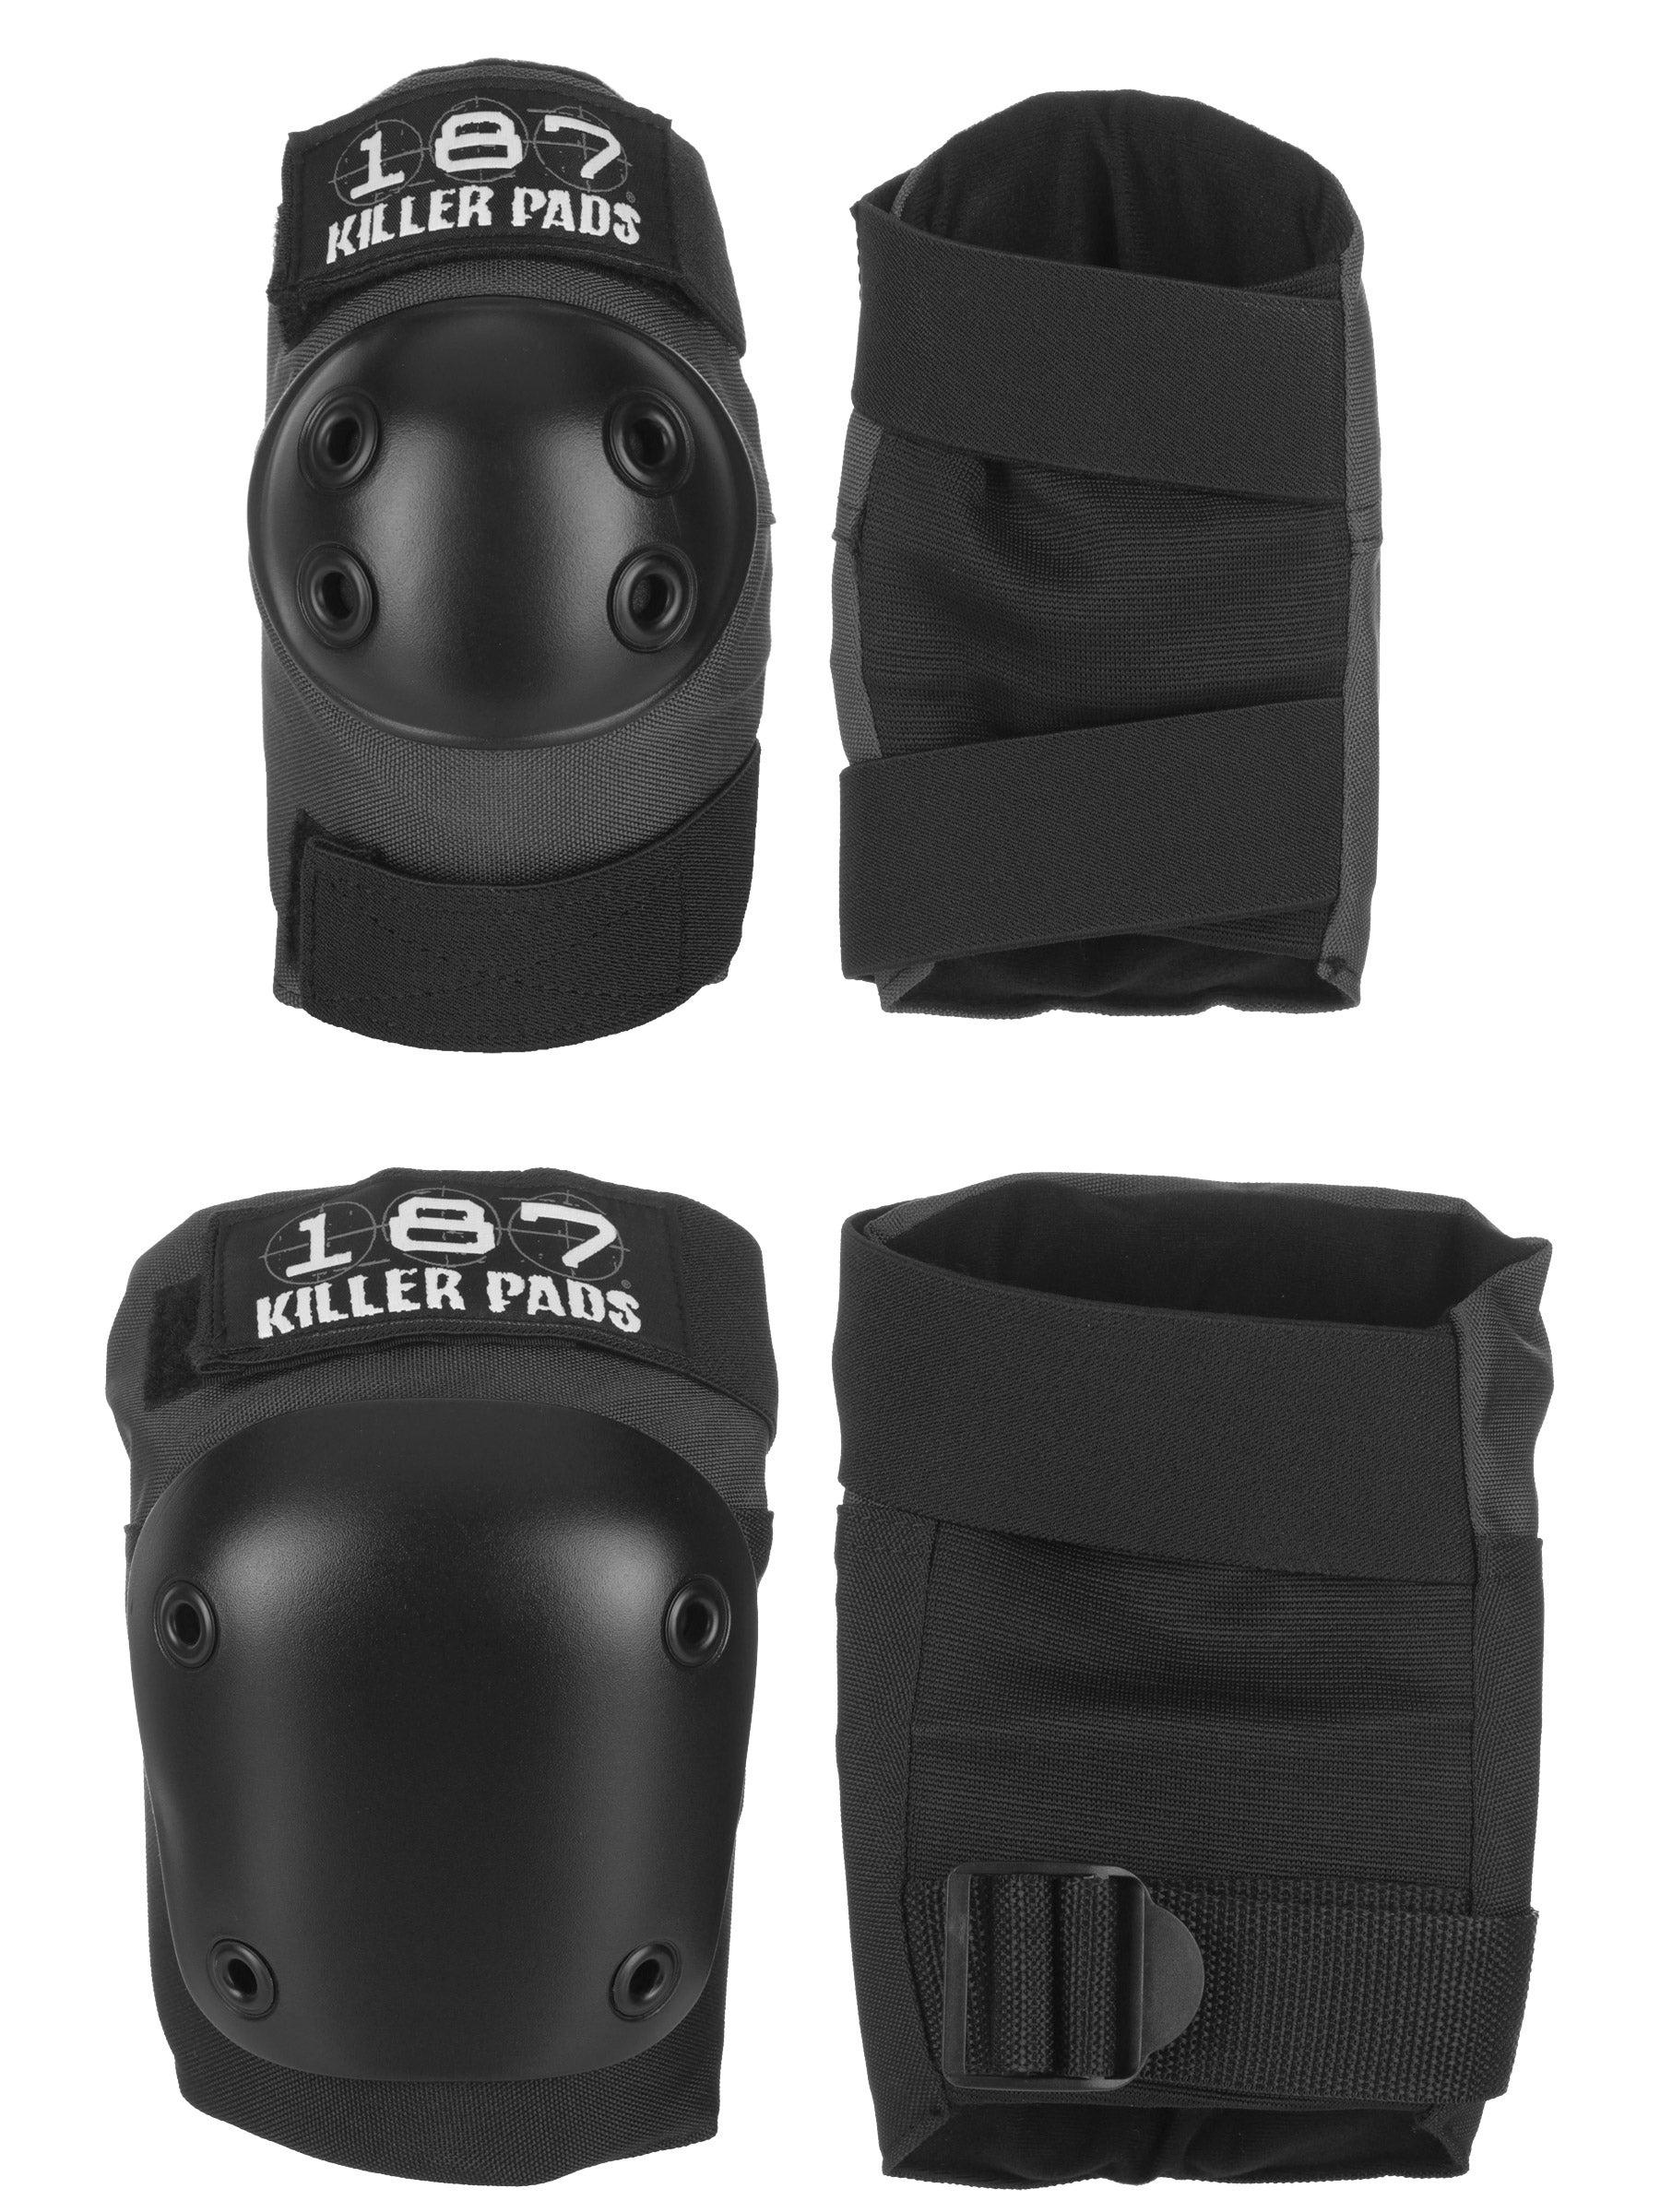 Smith Safety Gear Scabs Pro Wrist Stabilizer